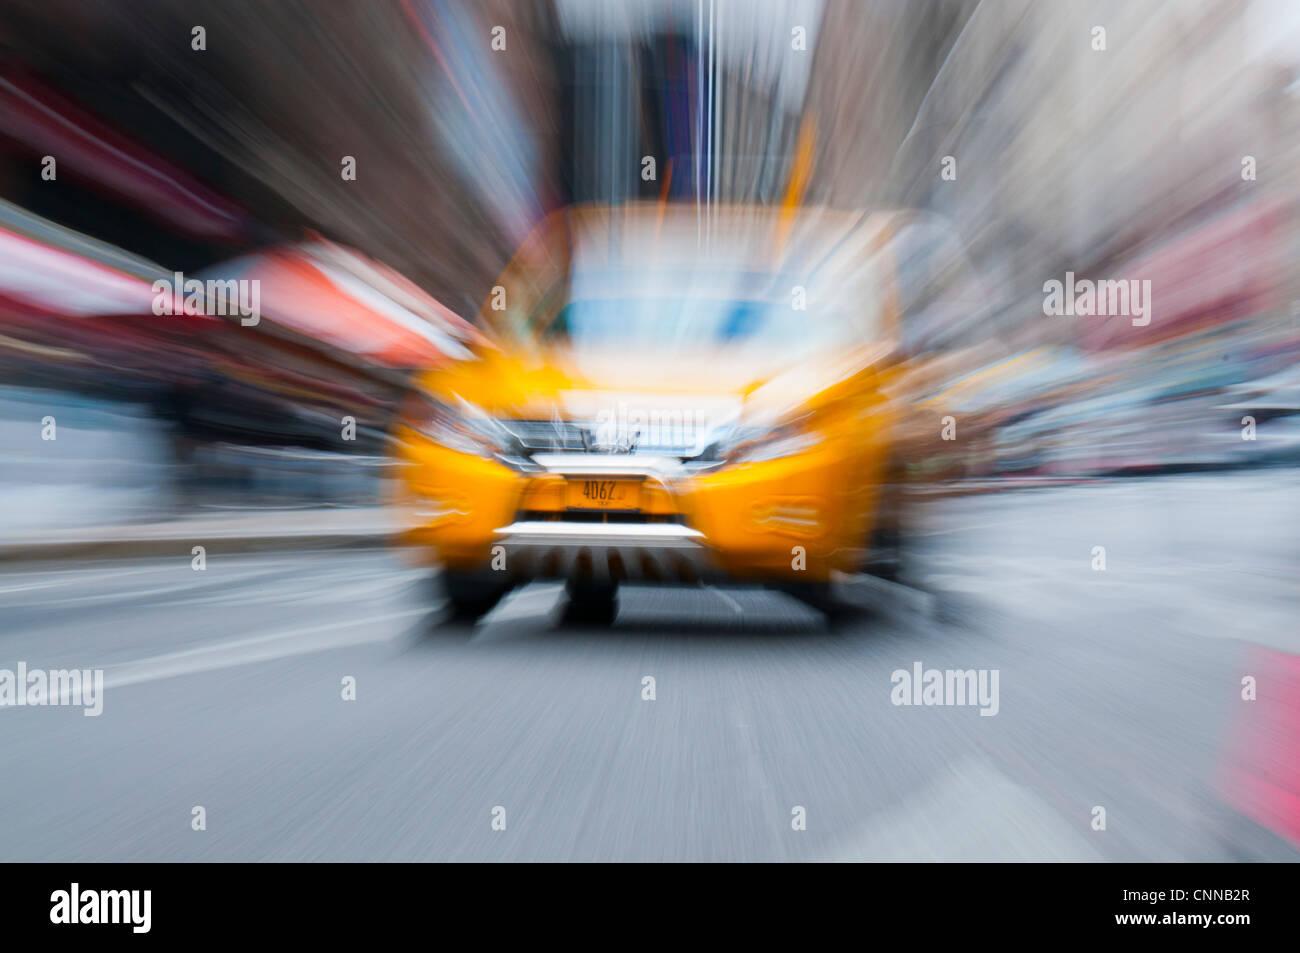 NYC taxicab - Stock Image